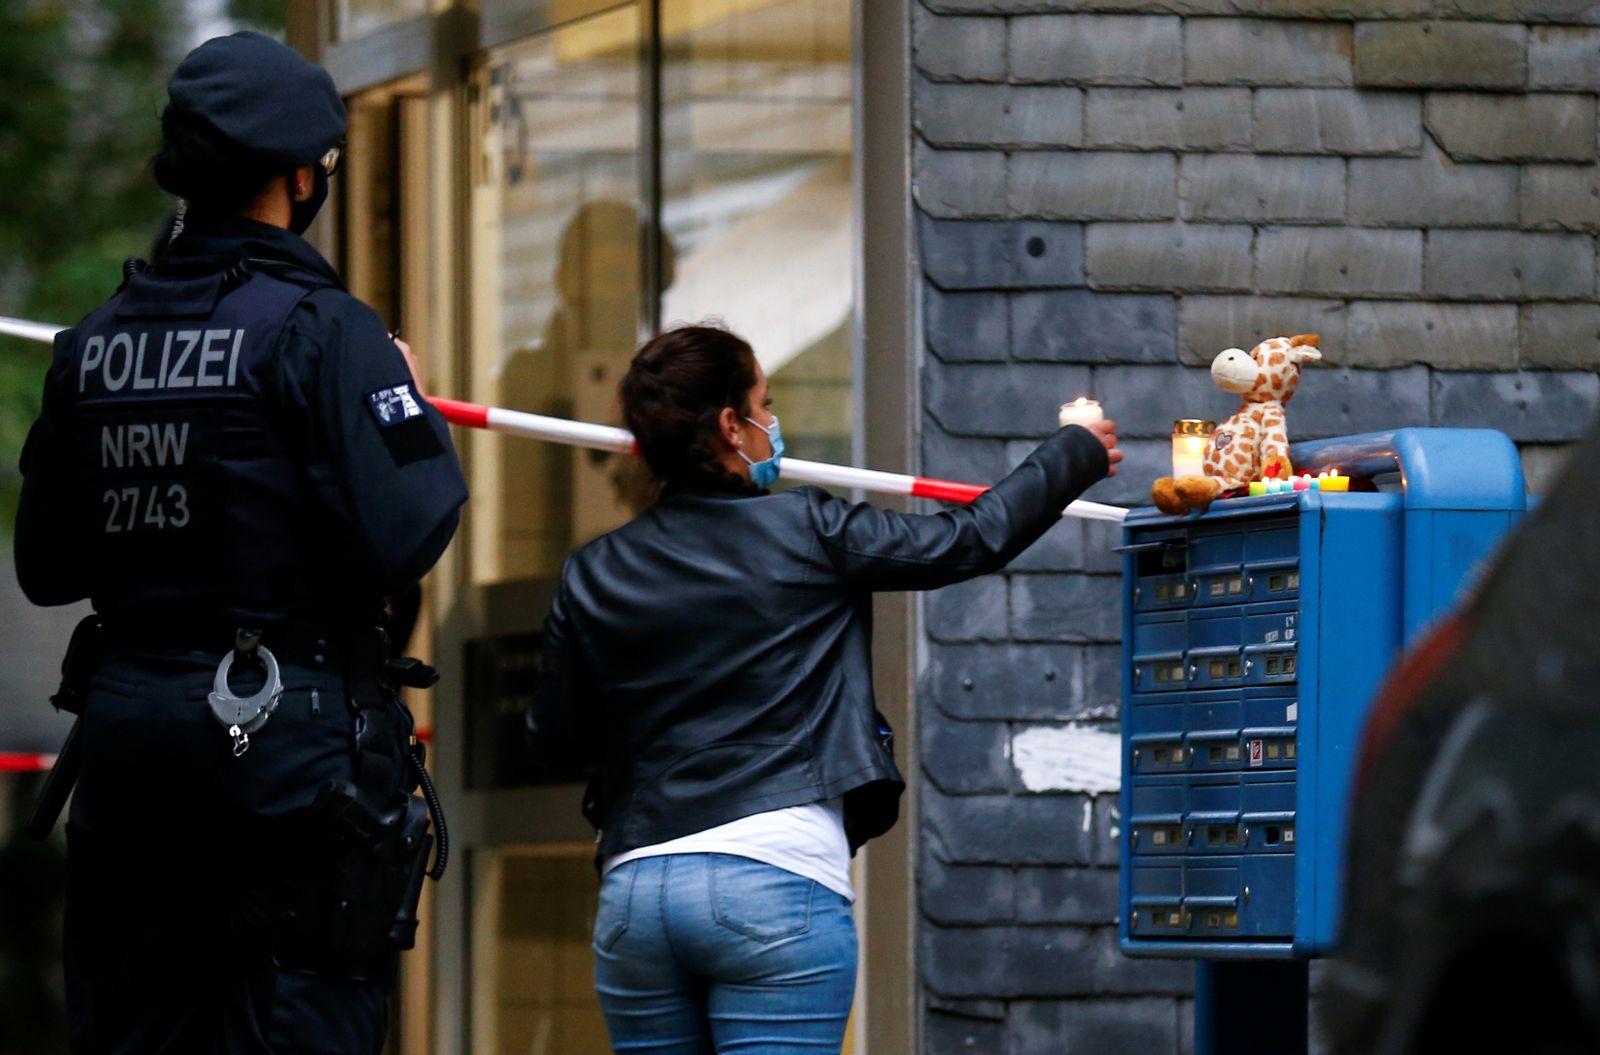 Police finds bodies of five children in Solingen